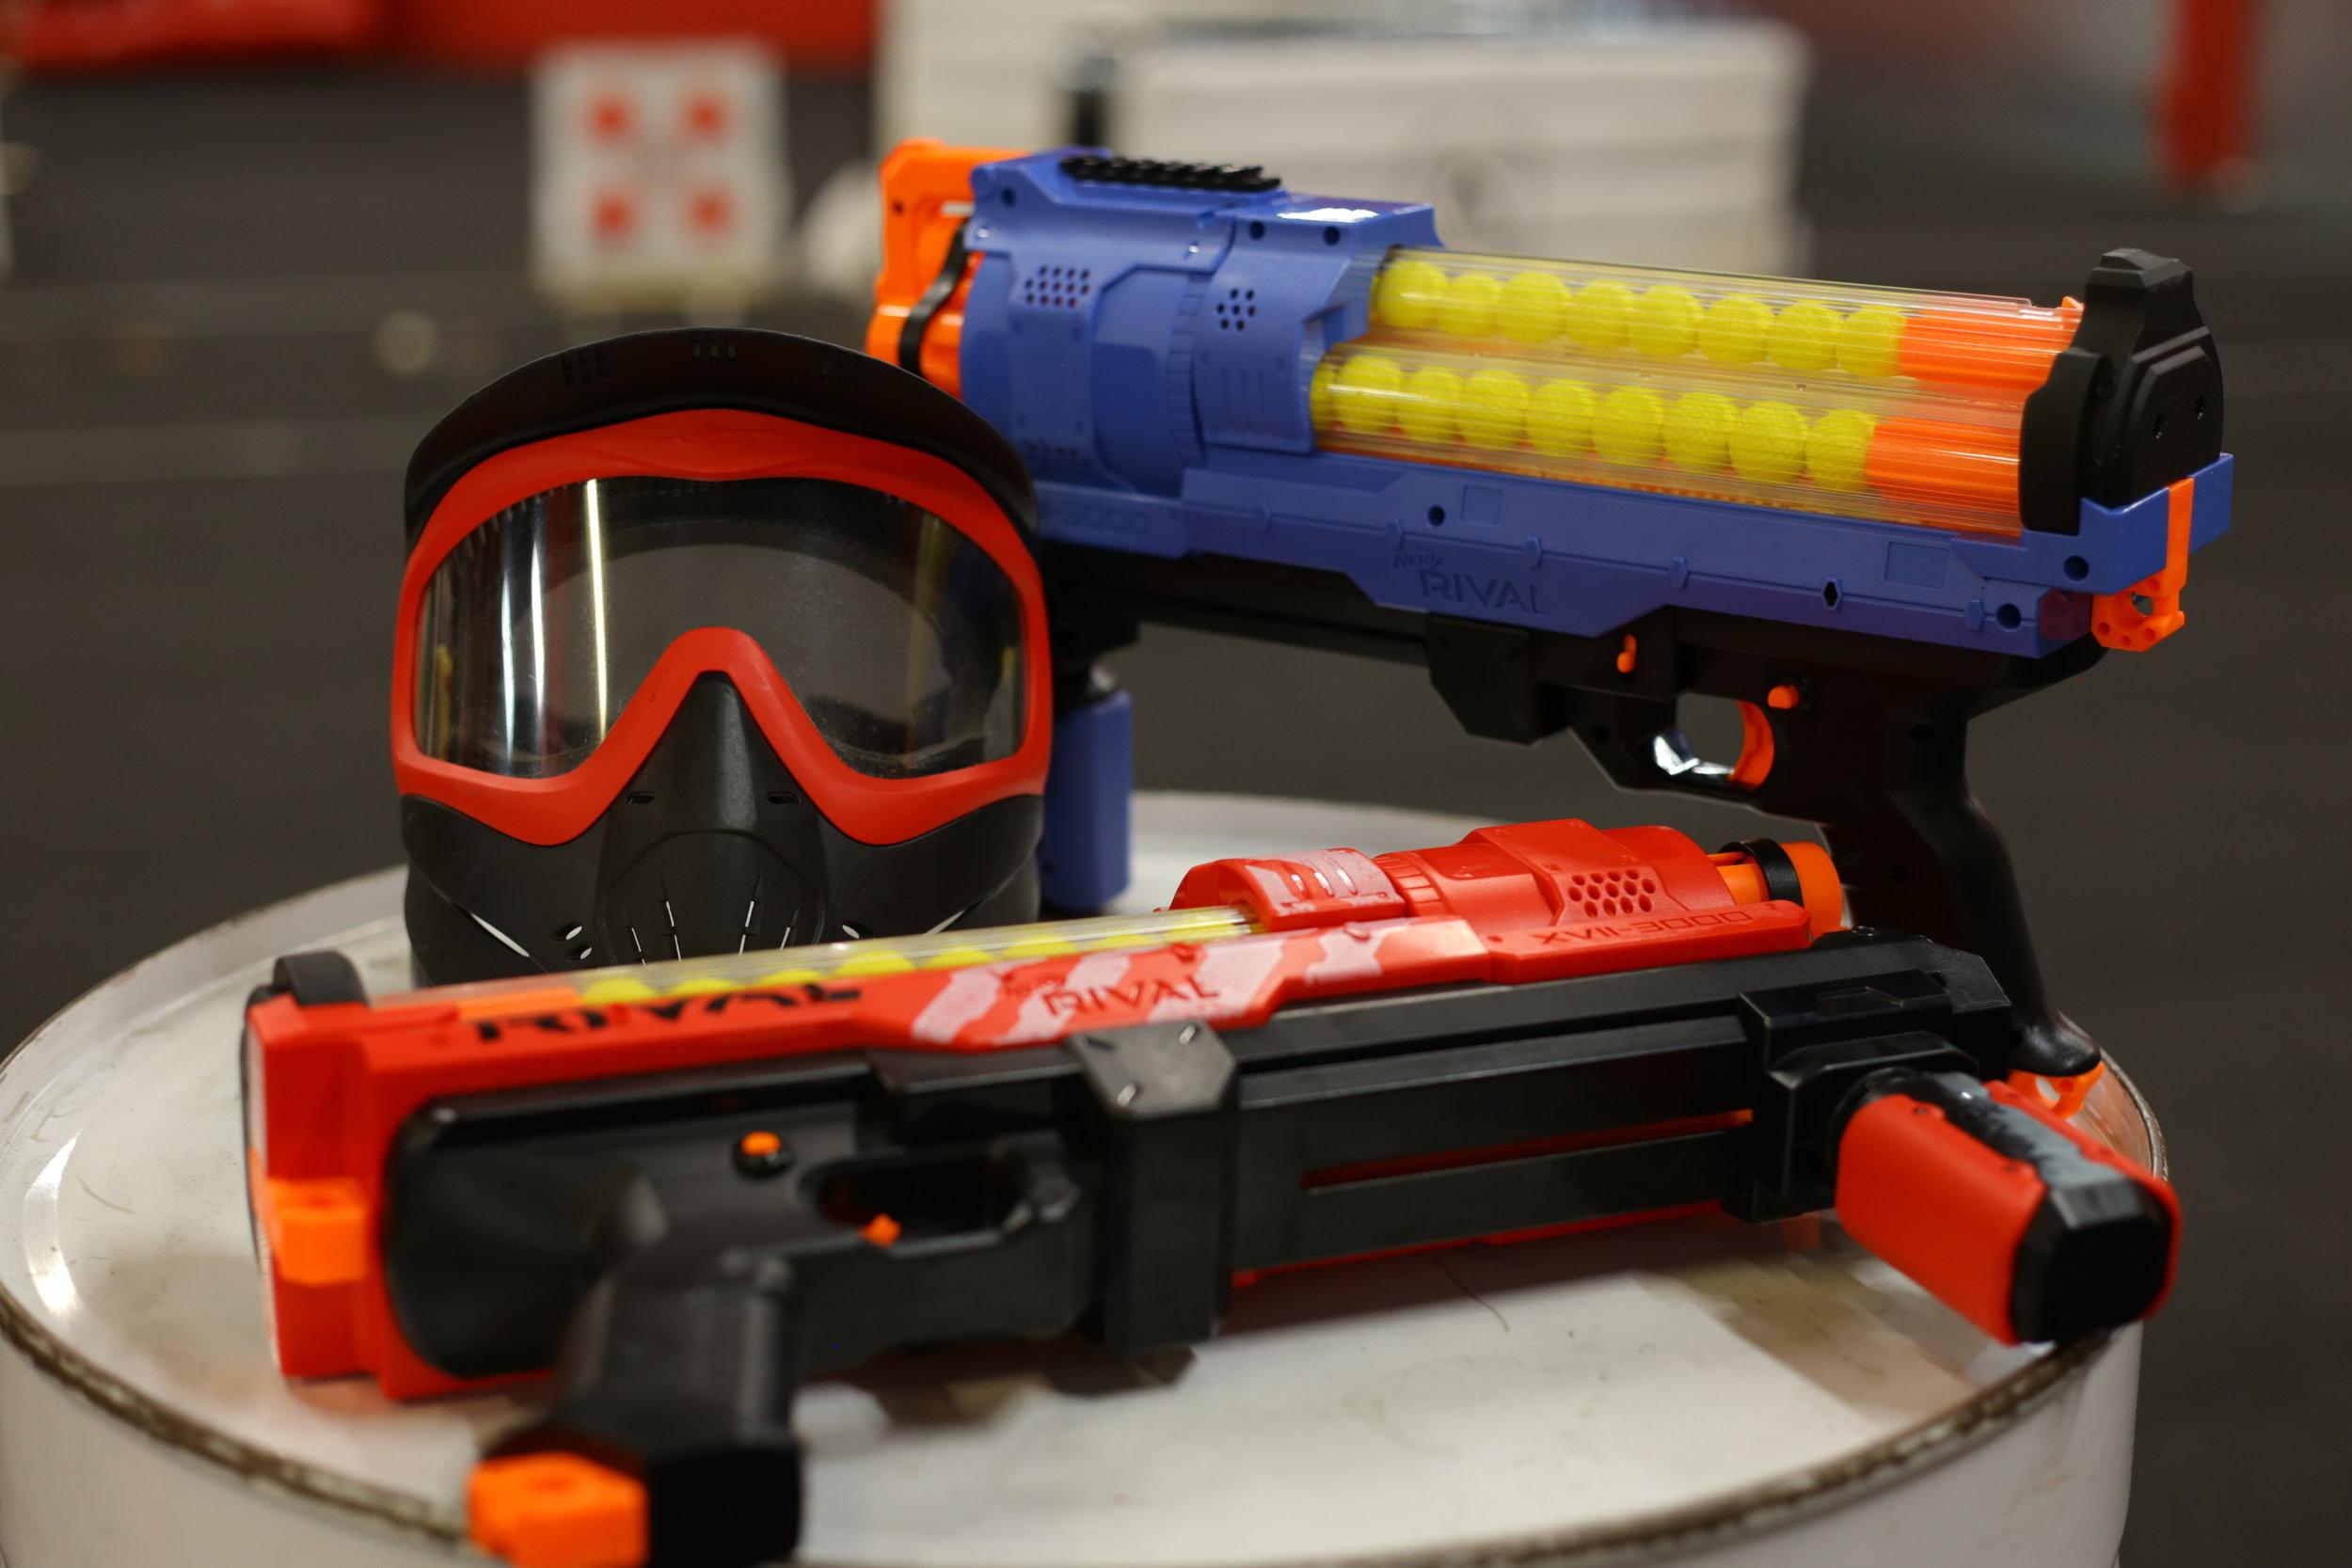 toronto nerf wars blue Elite Ex-3 strongarm archers arena nerf combat battle.JPG